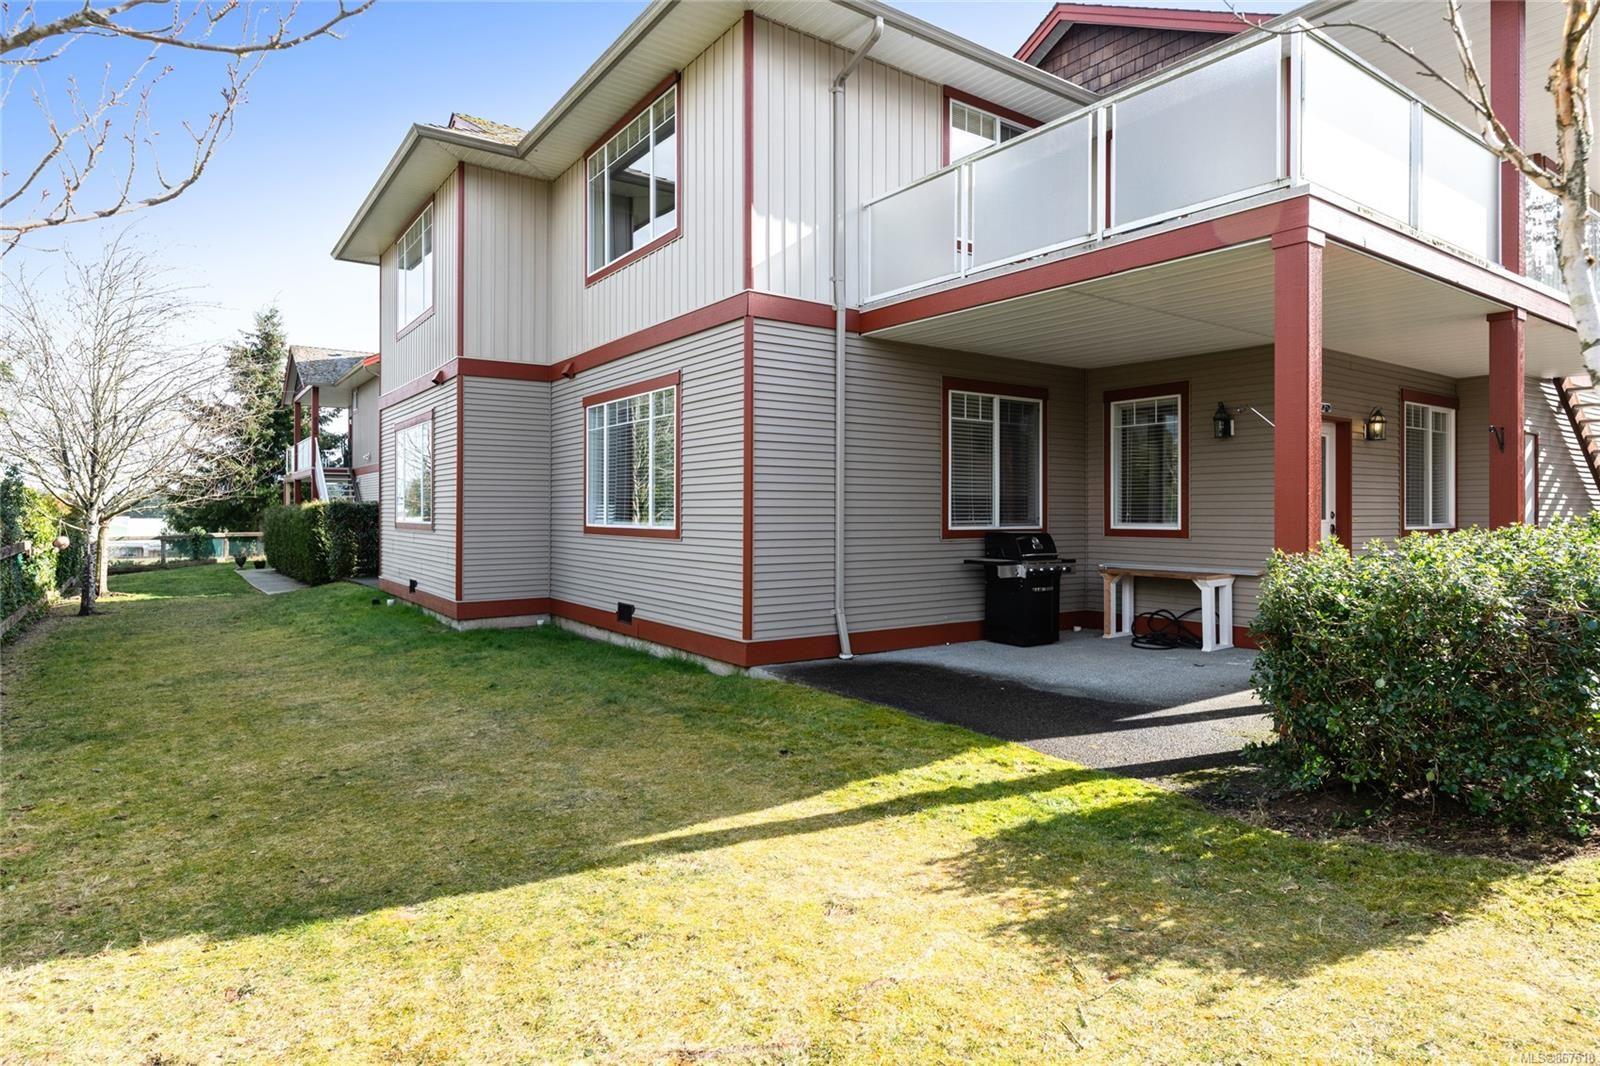 Main Photo: 6028 Leah Lane in : Na North Nanaimo Row/Townhouse for sale (Nanaimo)  : MLS®# 867518